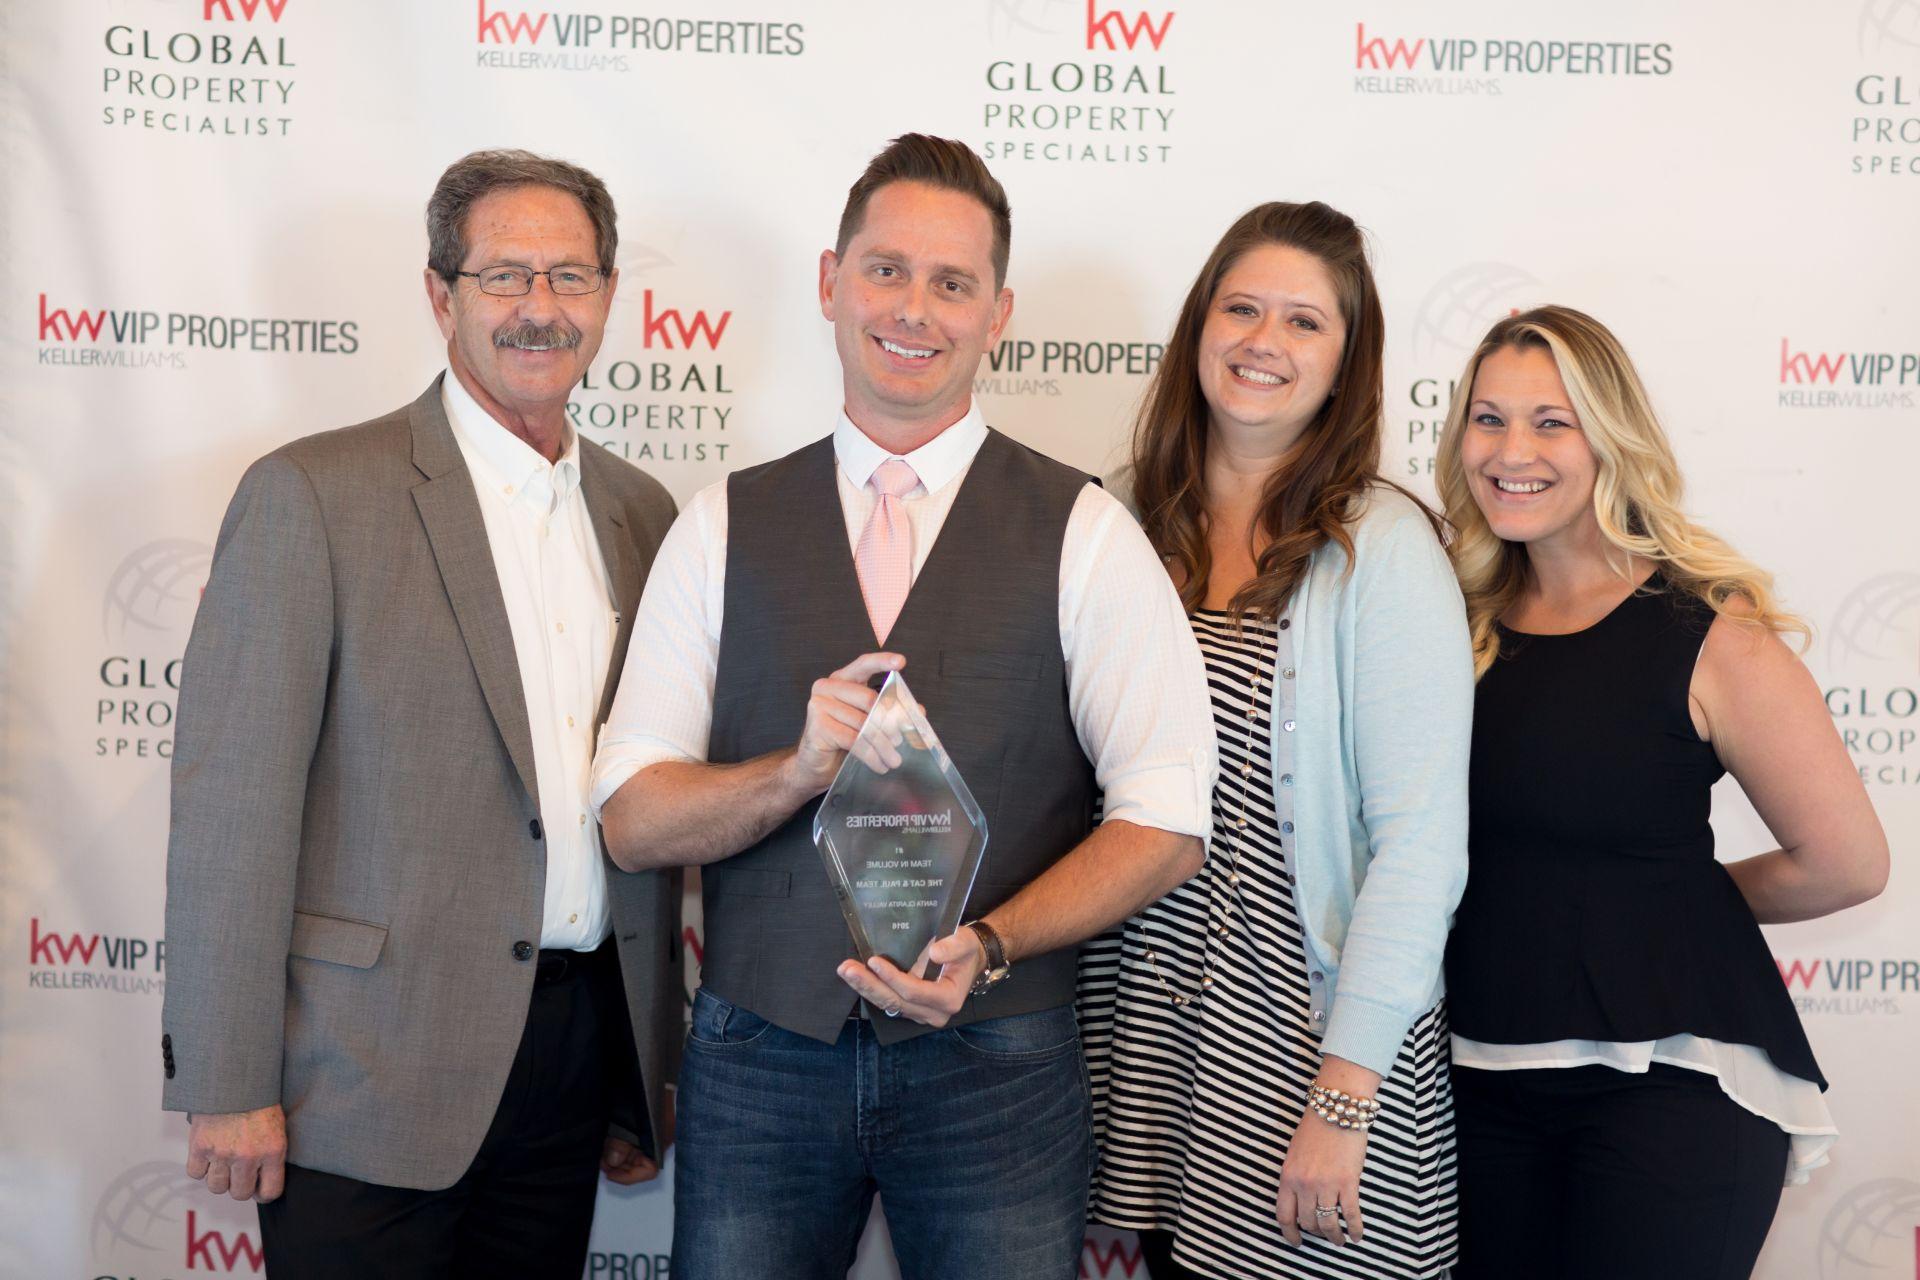 Santa Clarita Top Real Estate Agents Awarded for 2016 Sales